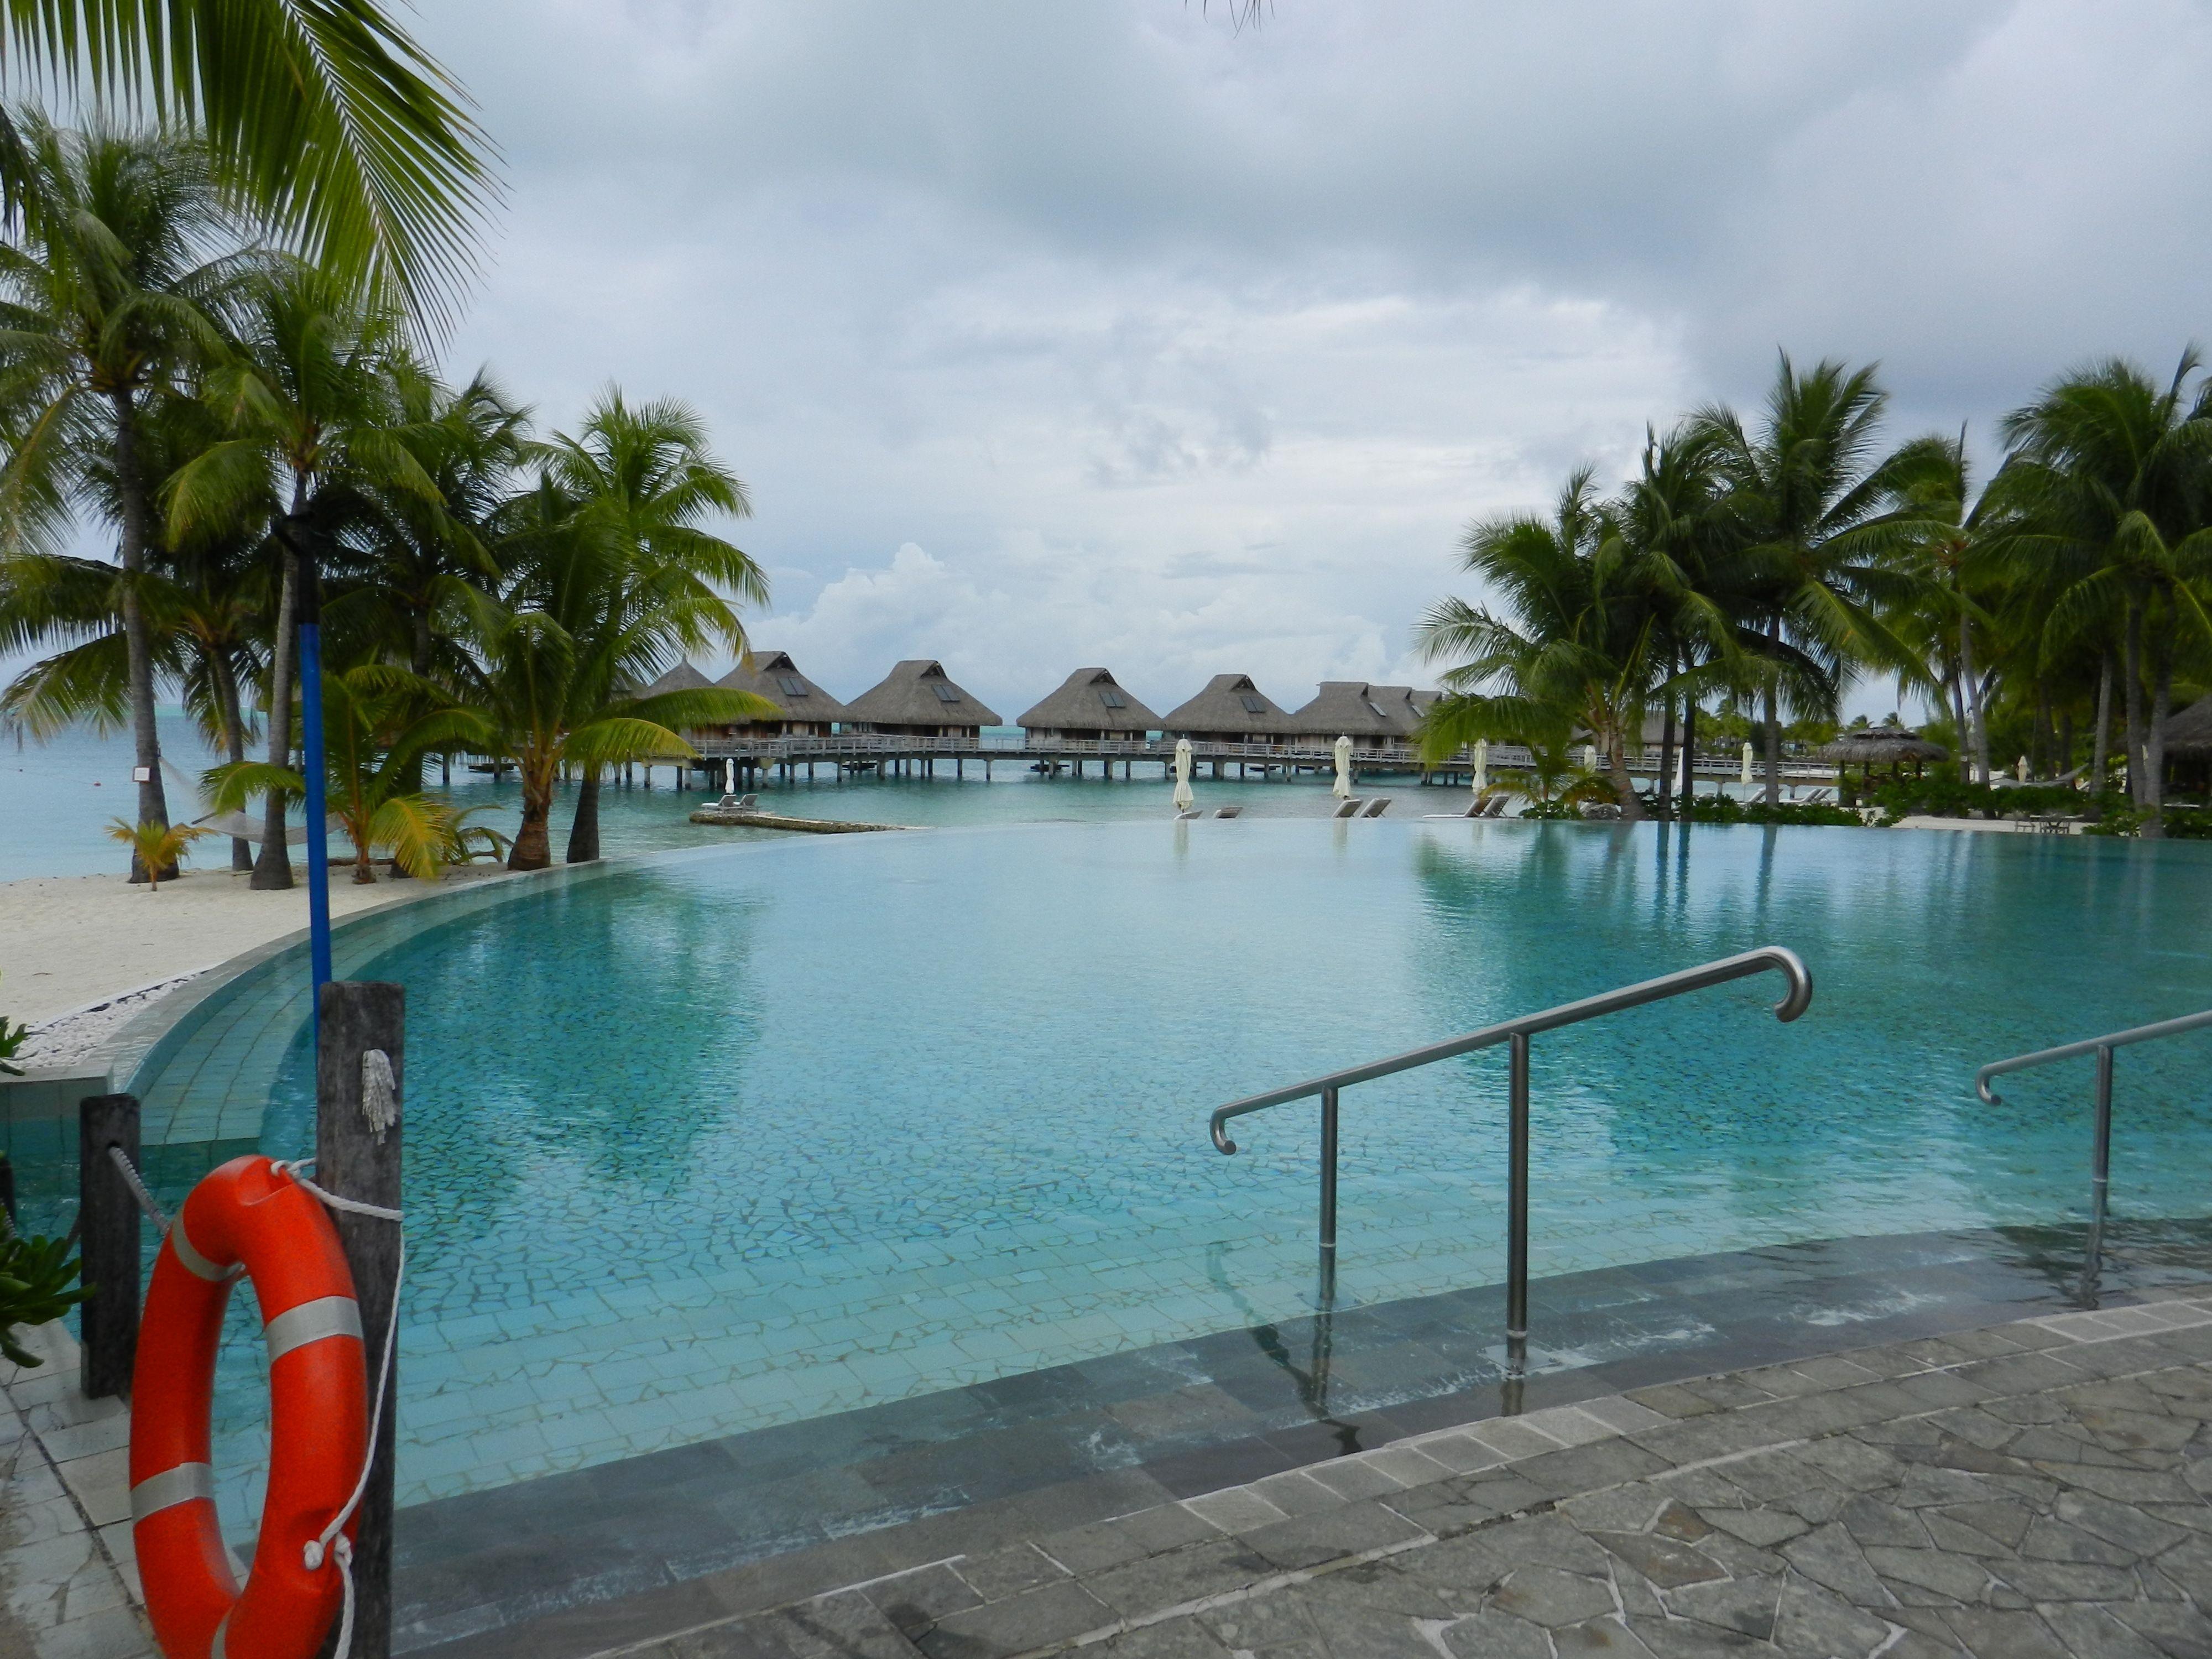 Edgeless pool at the Hilton Nui - Bora Bora | Bora Bora ...